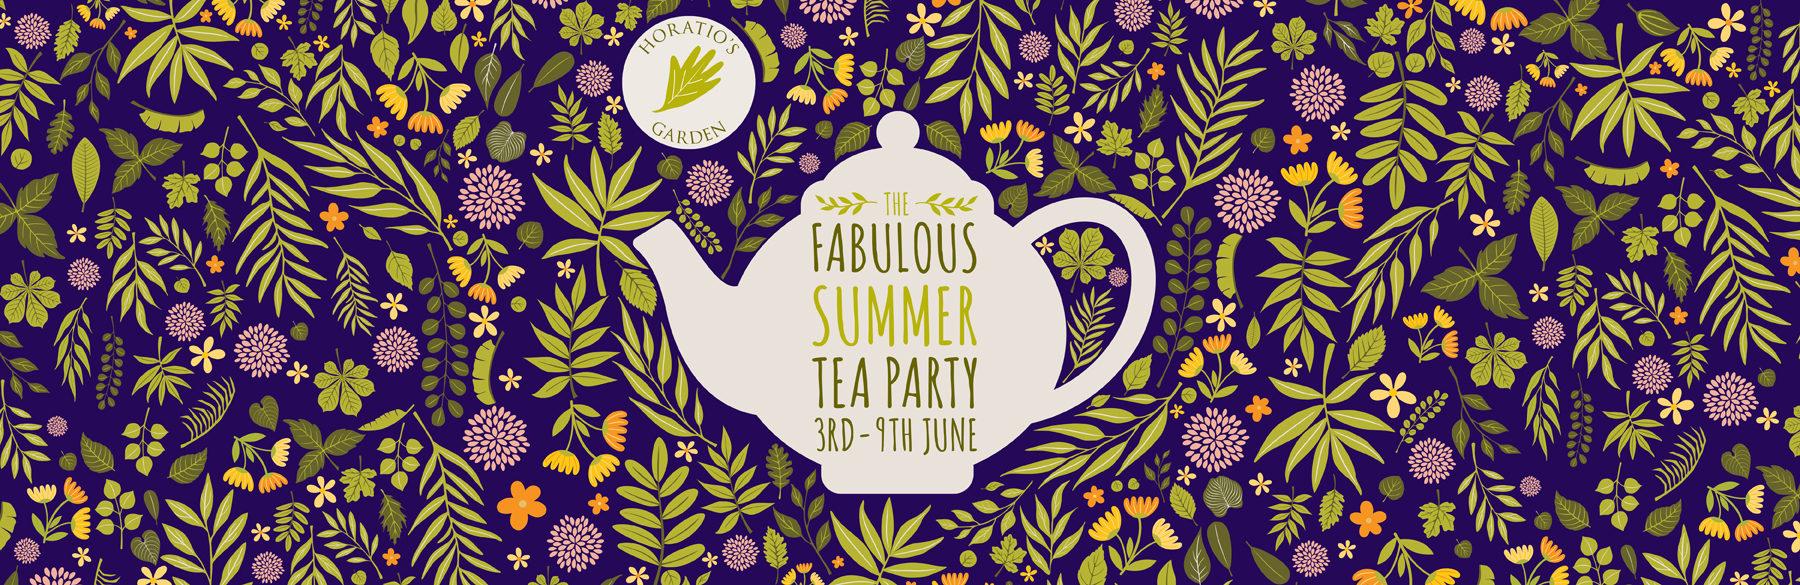 The Fabulous Summer Tea Party